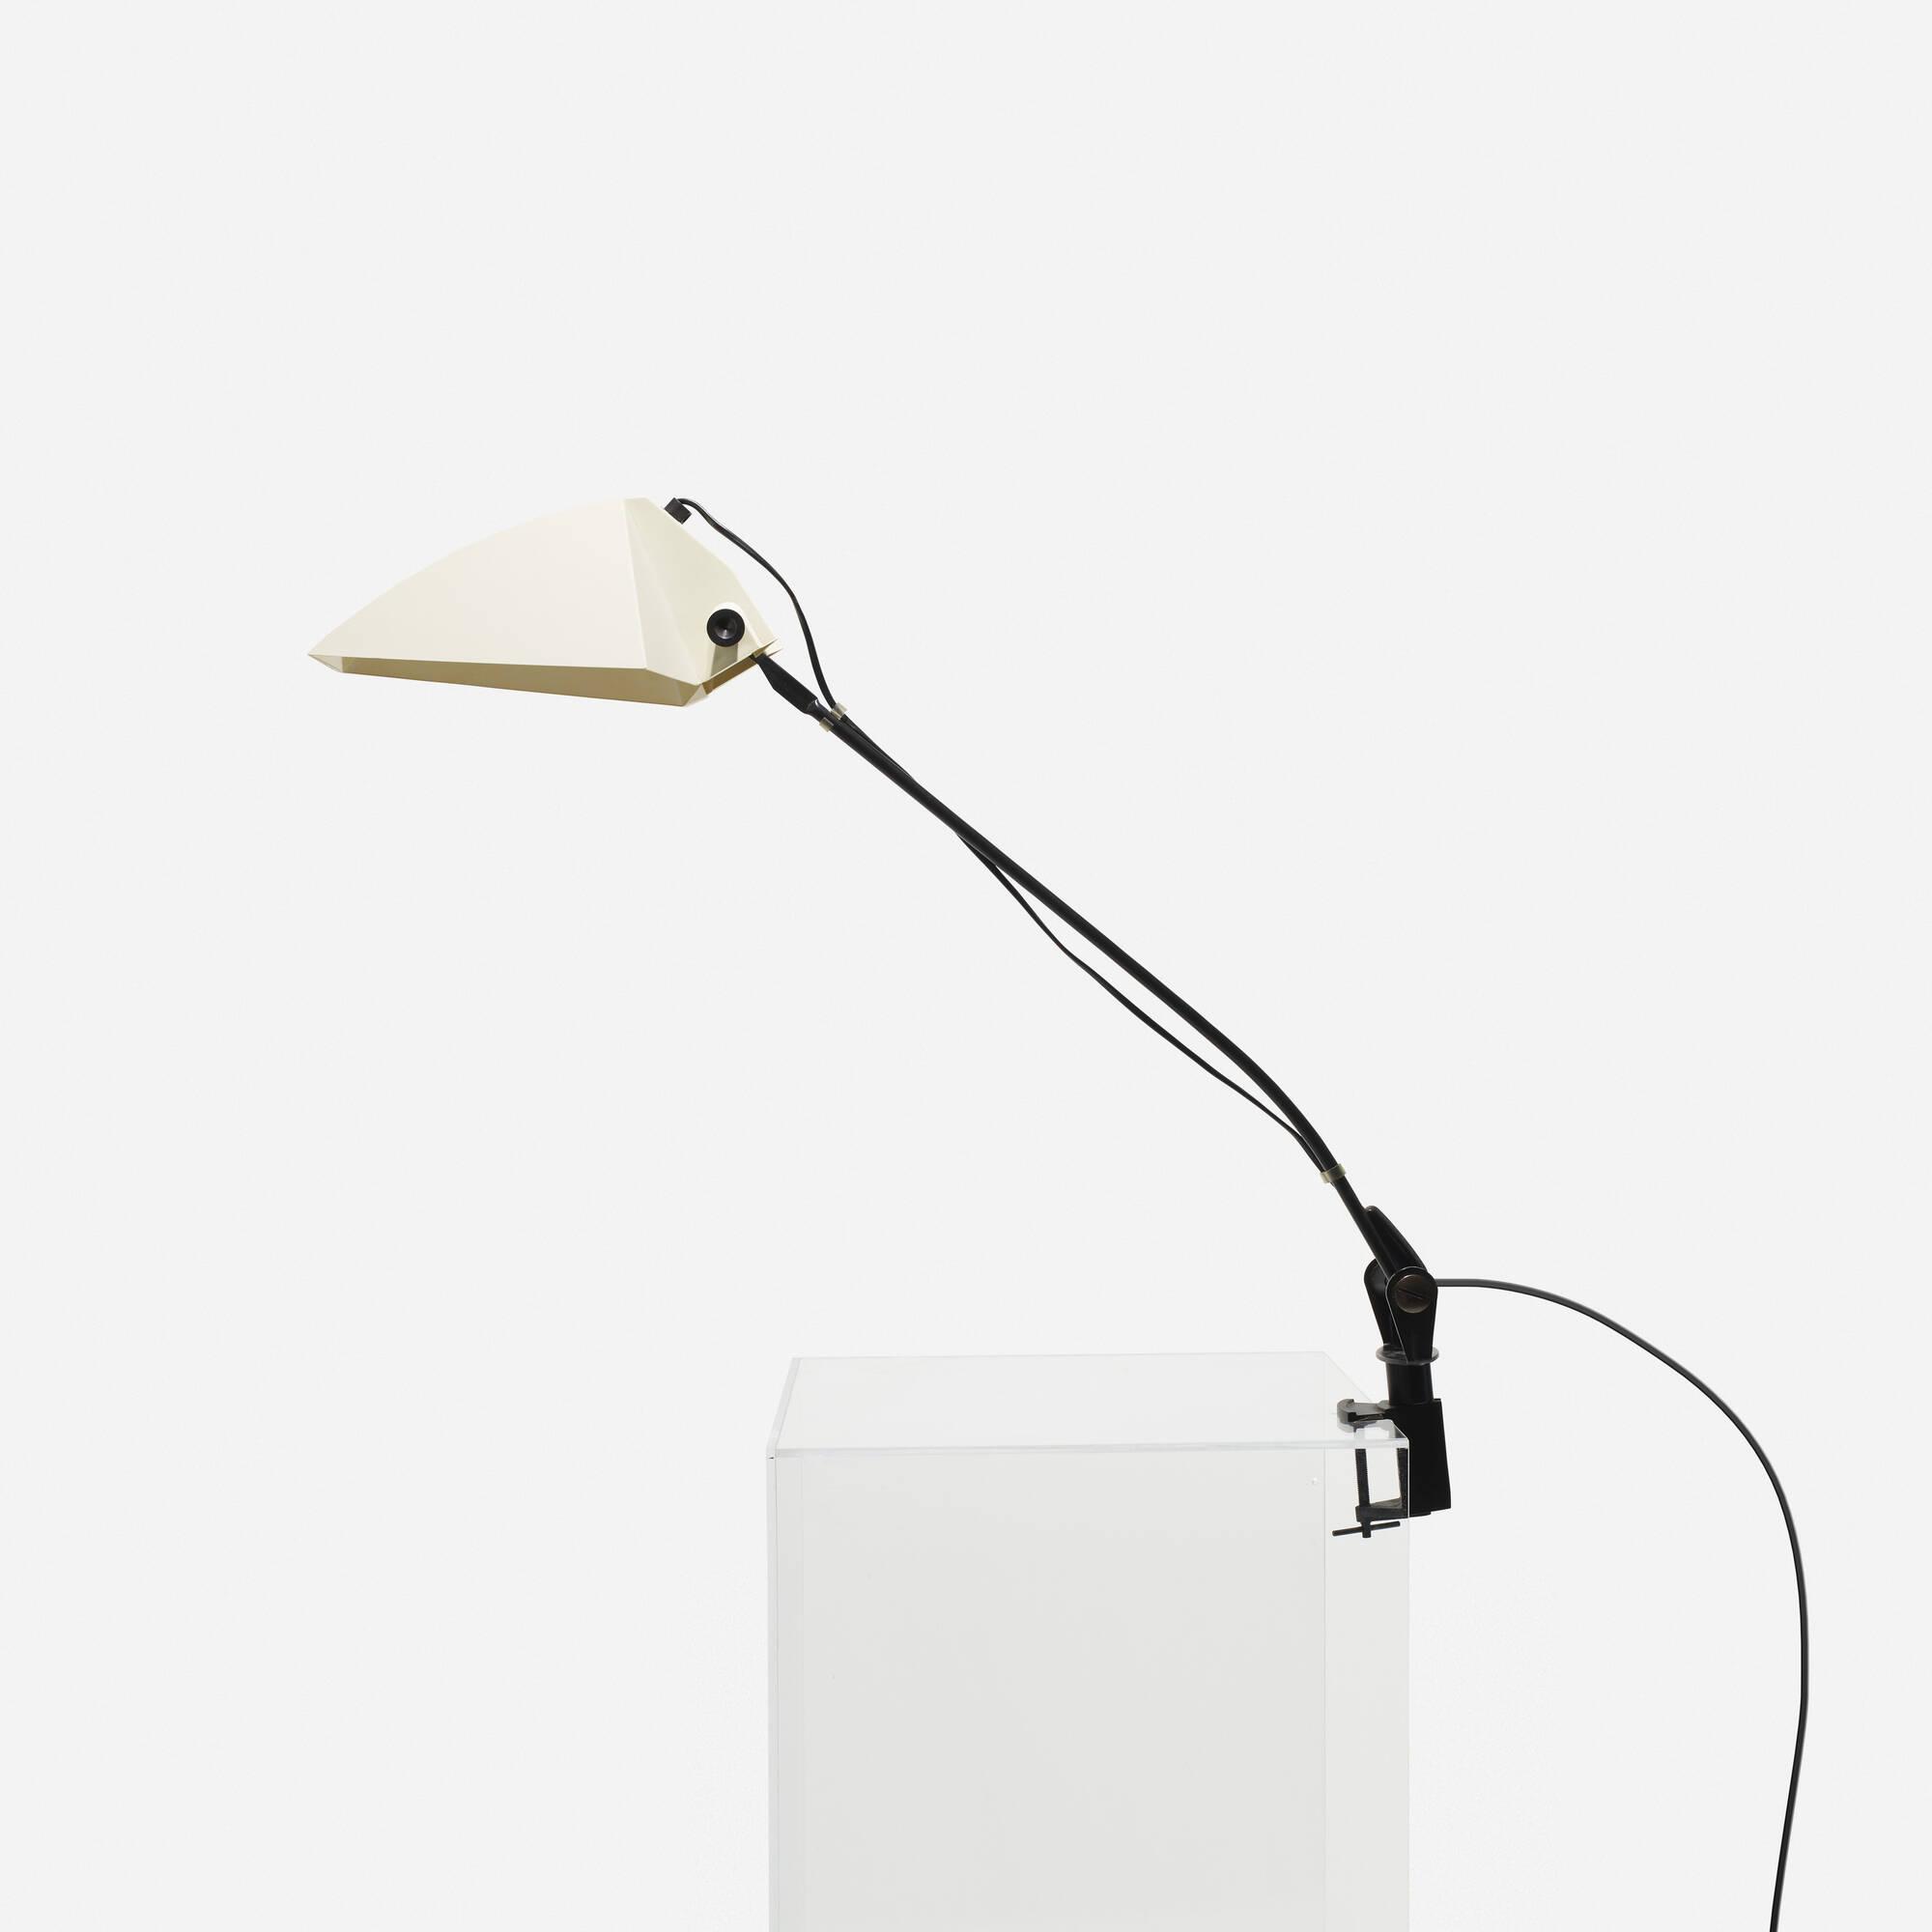 384: Umberto Riva / Dilem E63 vise lamp (1 of 1)